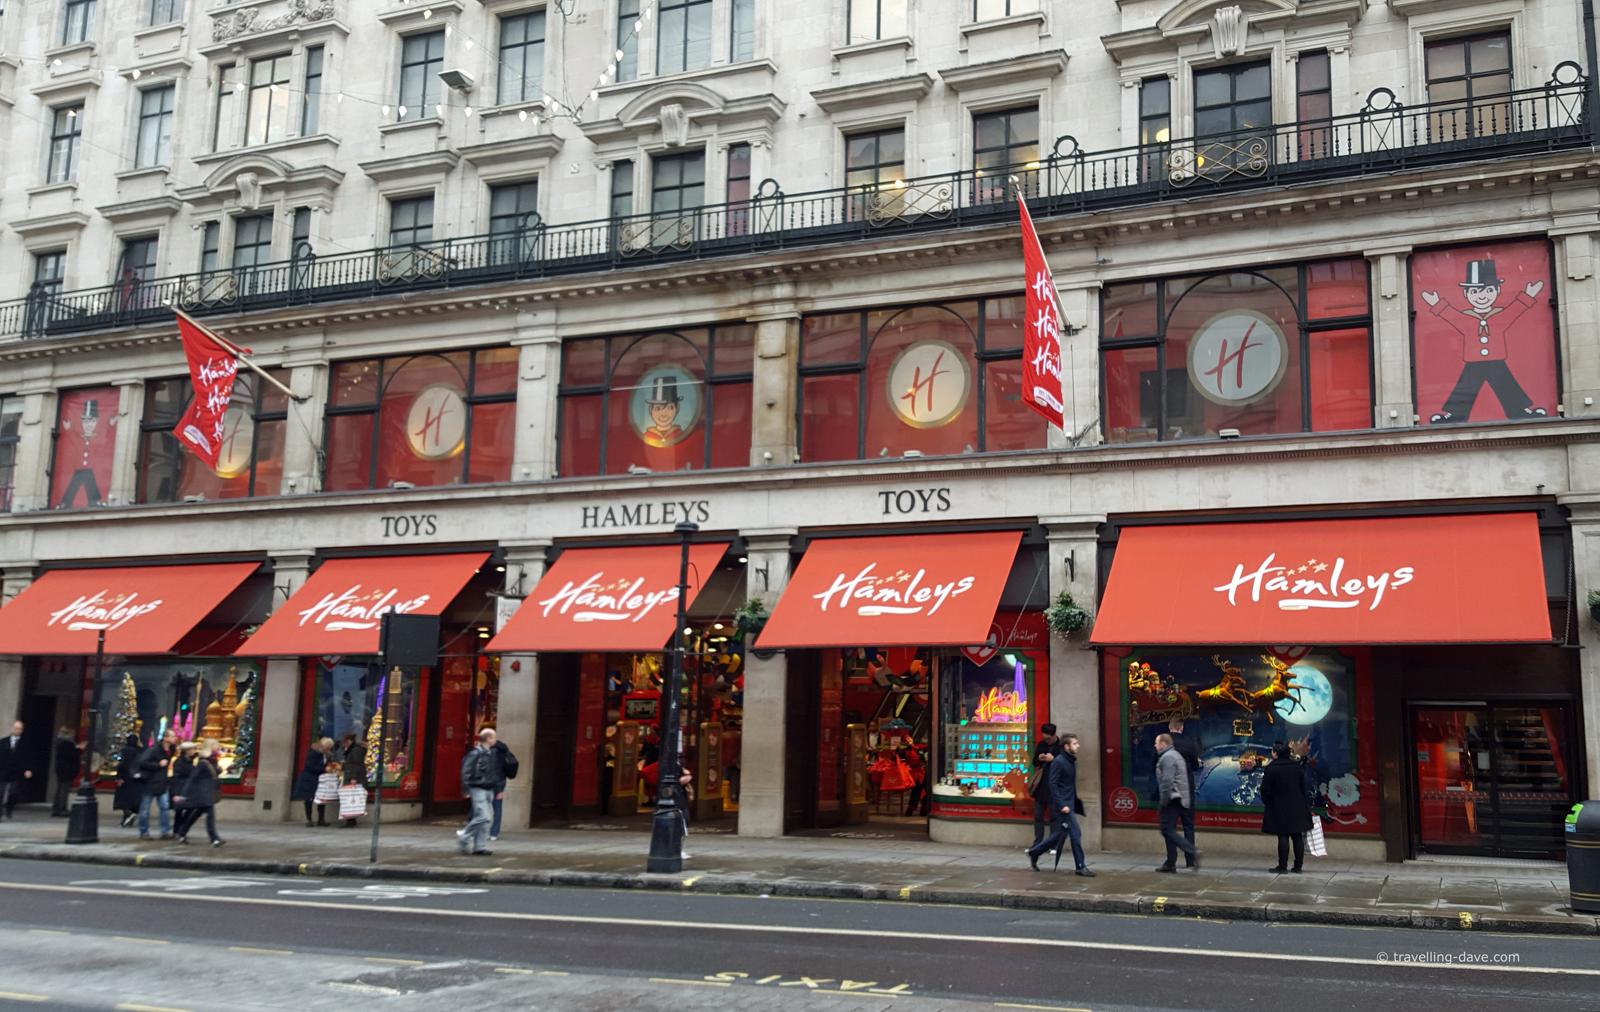 View of Hamleys Toy Store on Regent Street in London